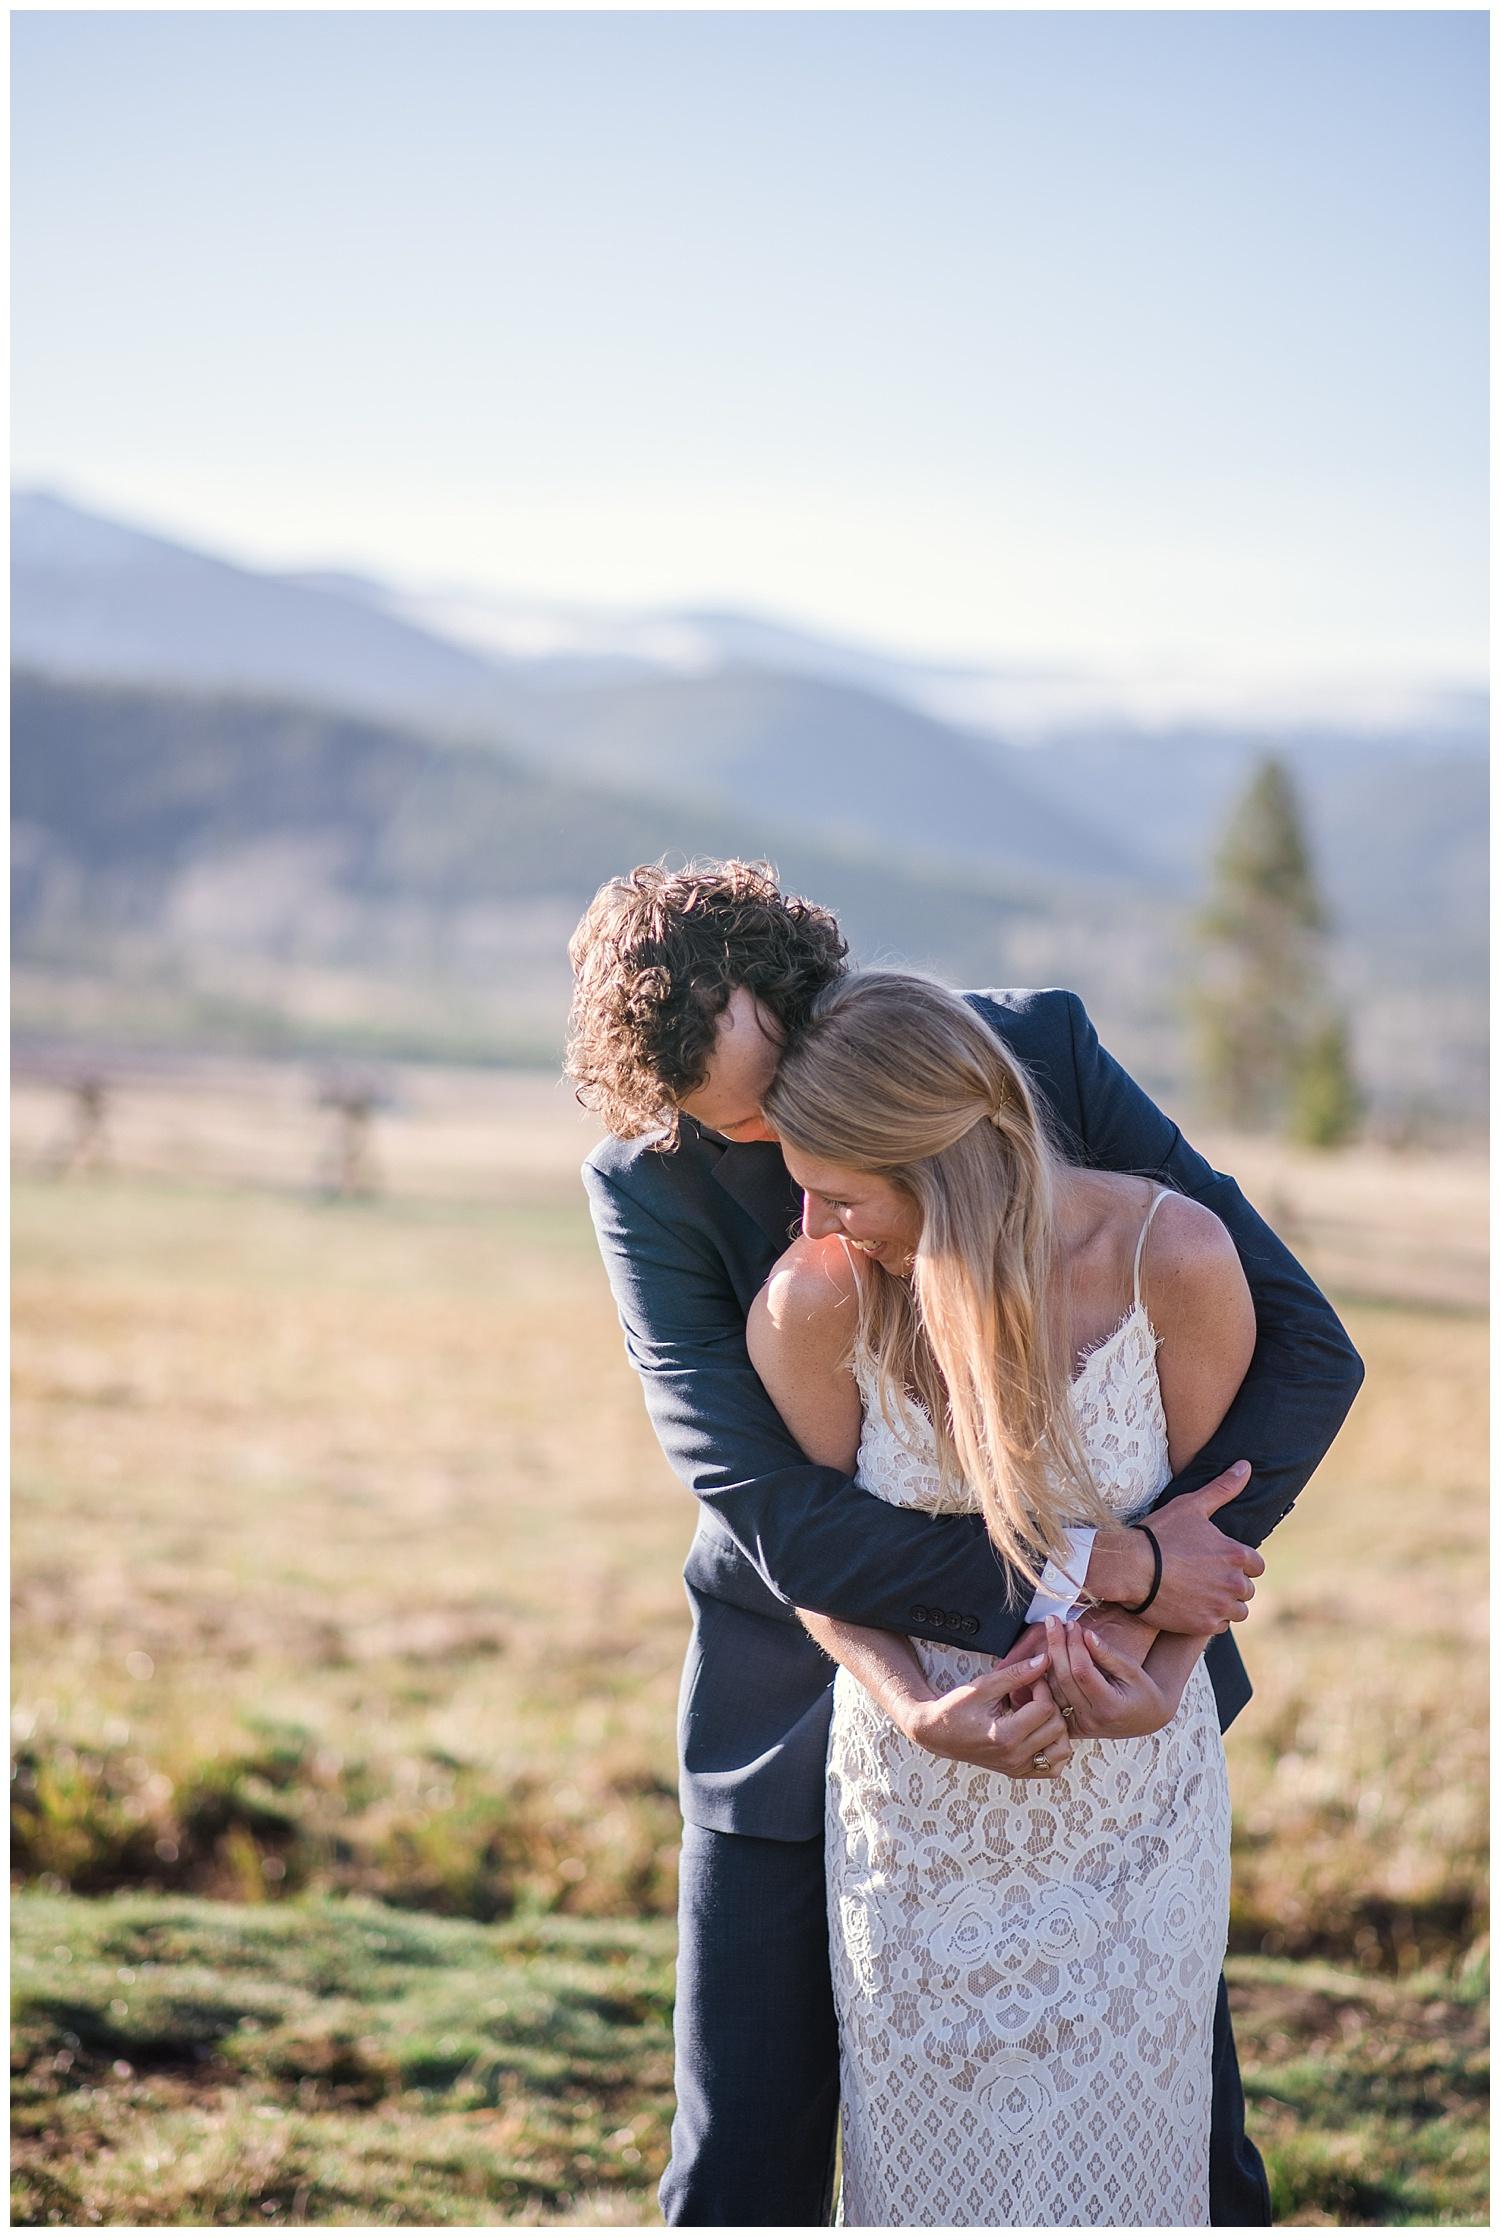 romantic bride and groom portraits in rocky mountain national park, colorado wedding photographer, denver wedding photographer, colorado elopement photographer, denver elopement photographer, rocky mountain photographer